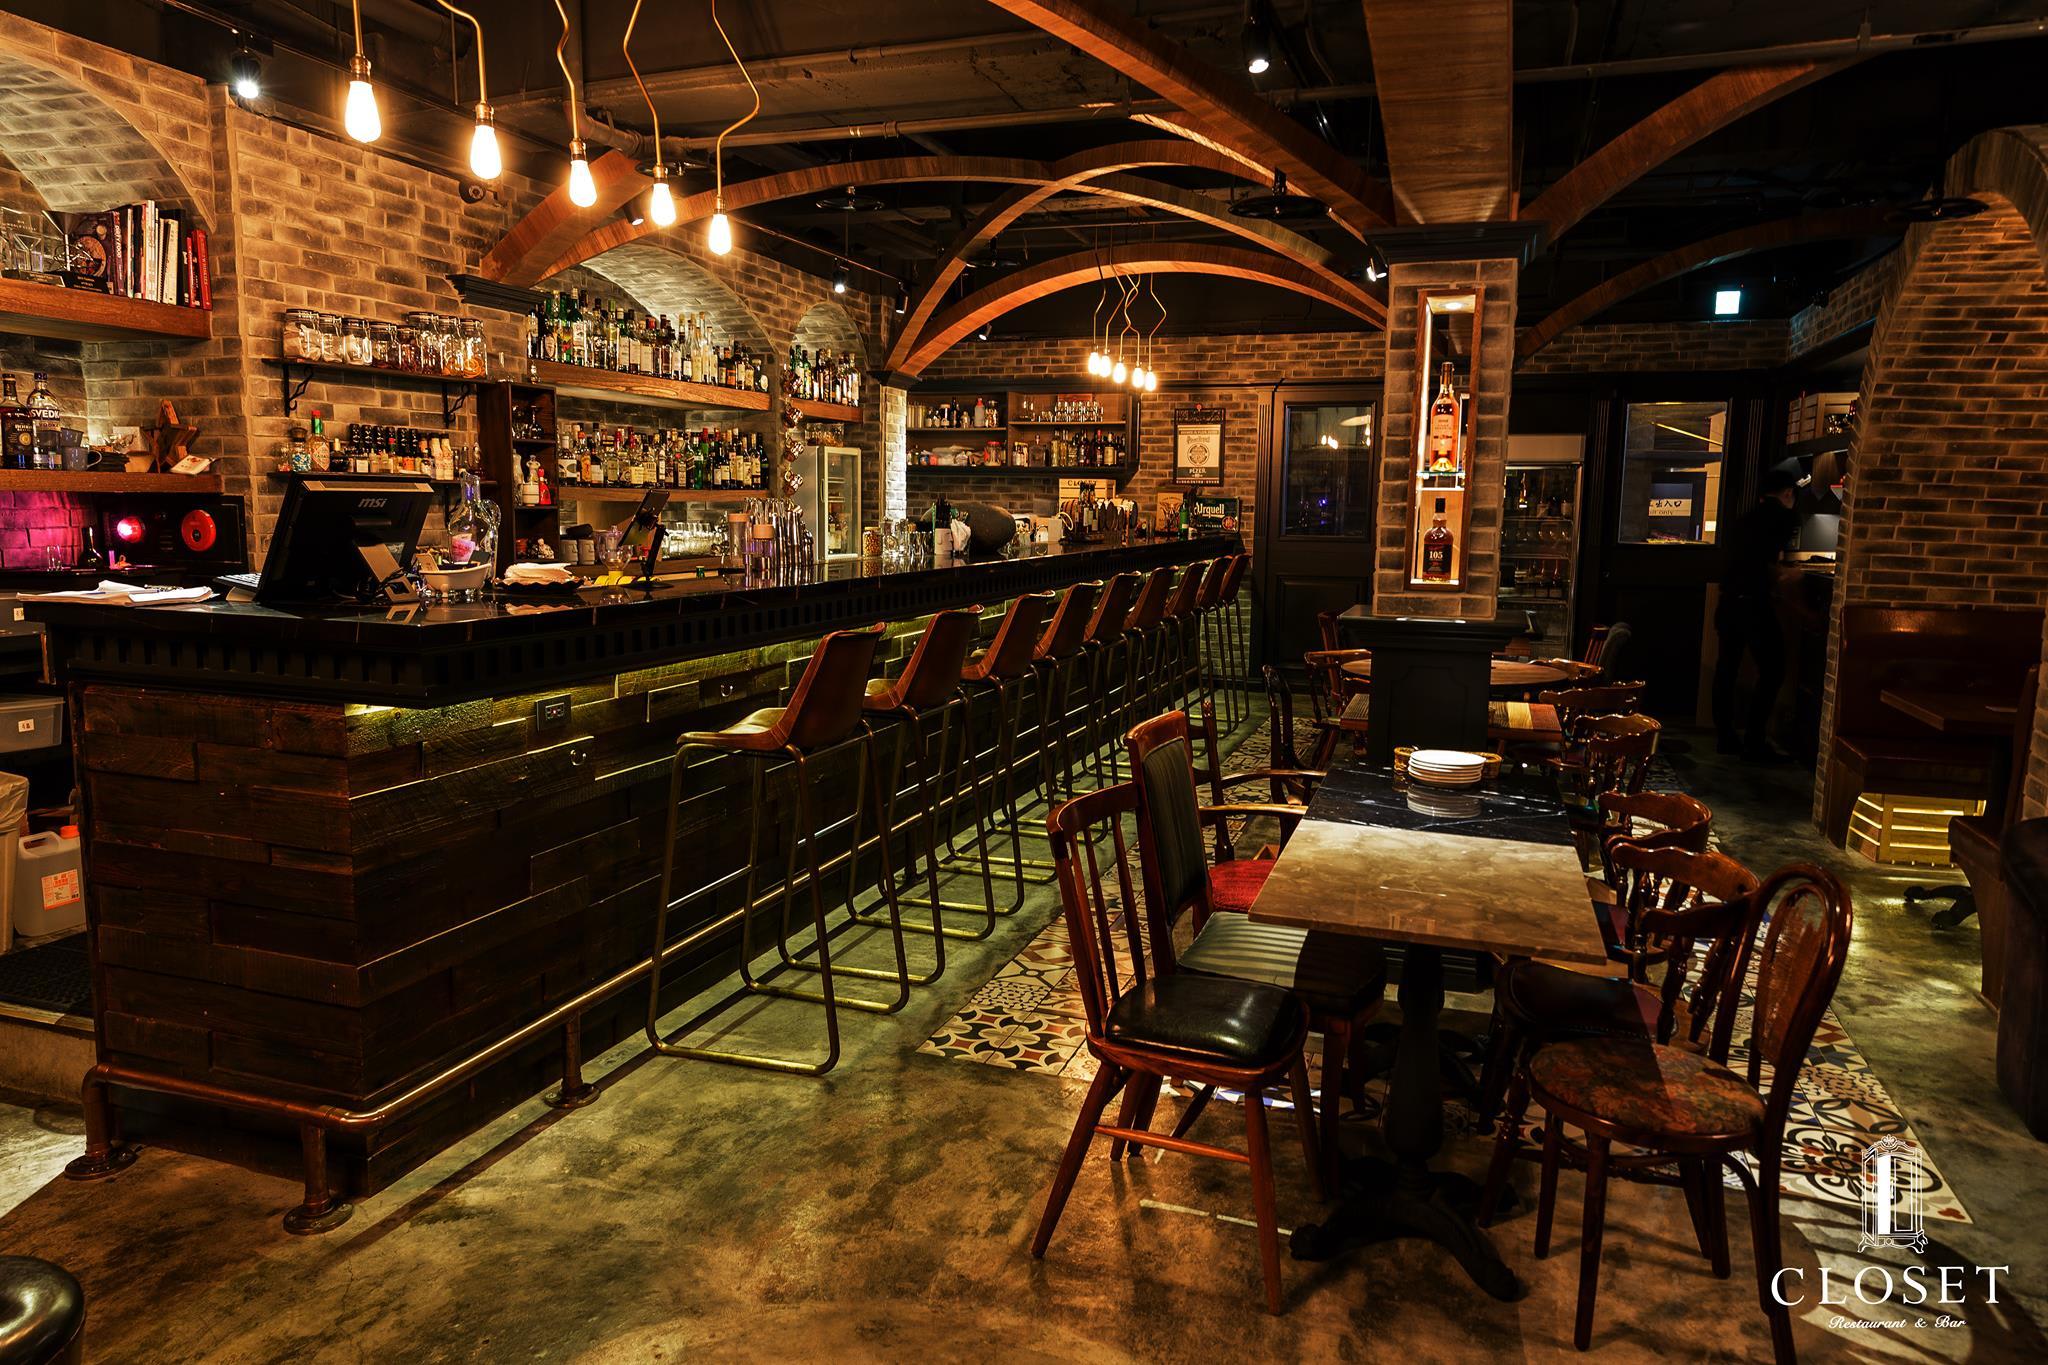 照 片 來 源 : Closet Restaurant & Bar CC by 2.0